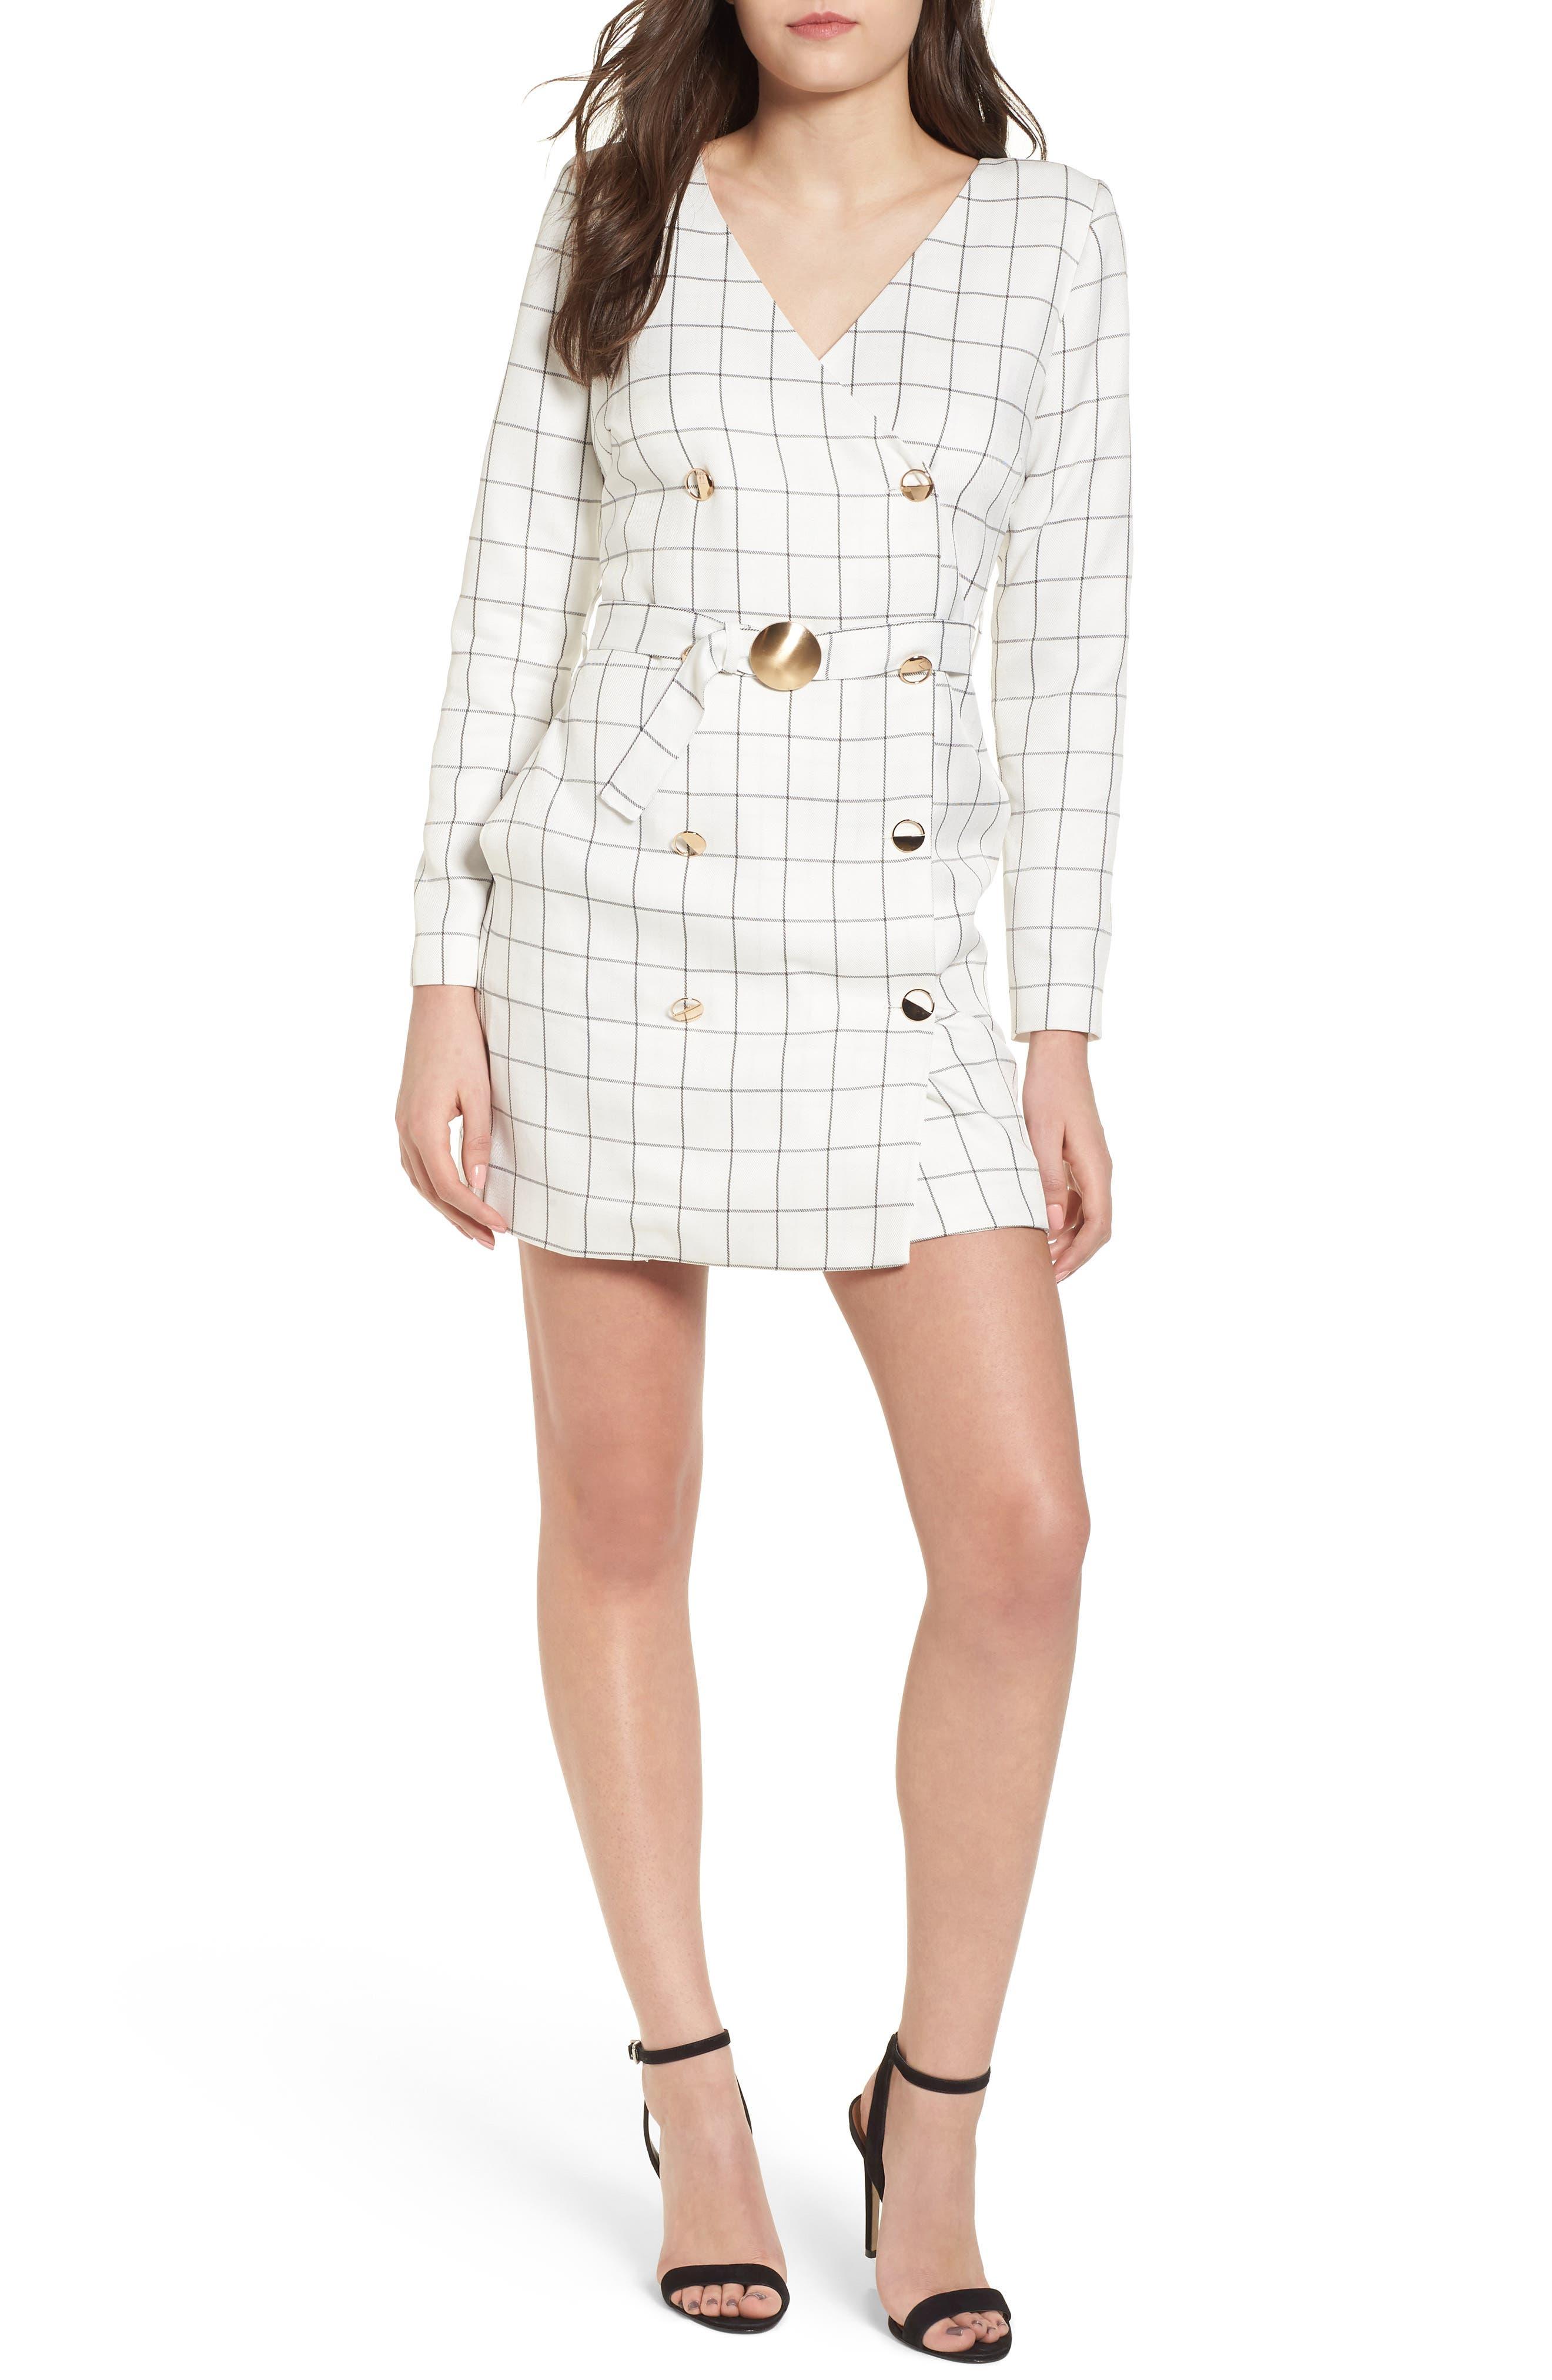 Chriselle x J.O.A. Blazer Minidress,                         Main,                         color, 100